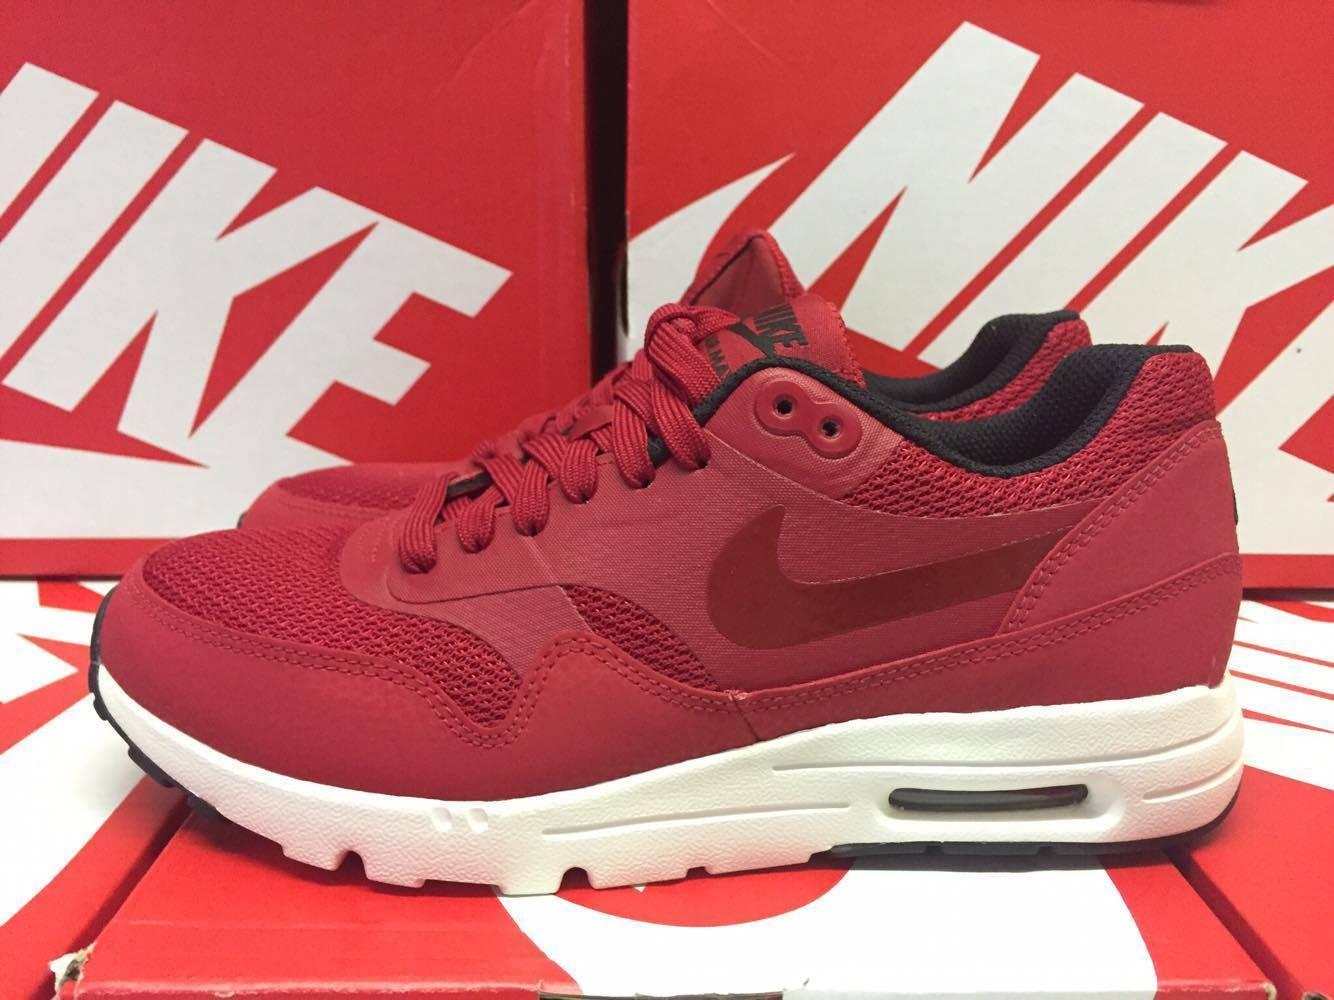 Nike Air Max 1 Ultra Essentials ROT Running Damenschuhe UK 5 EUR 38.5 ROT Essentials 704993 600 f56af5